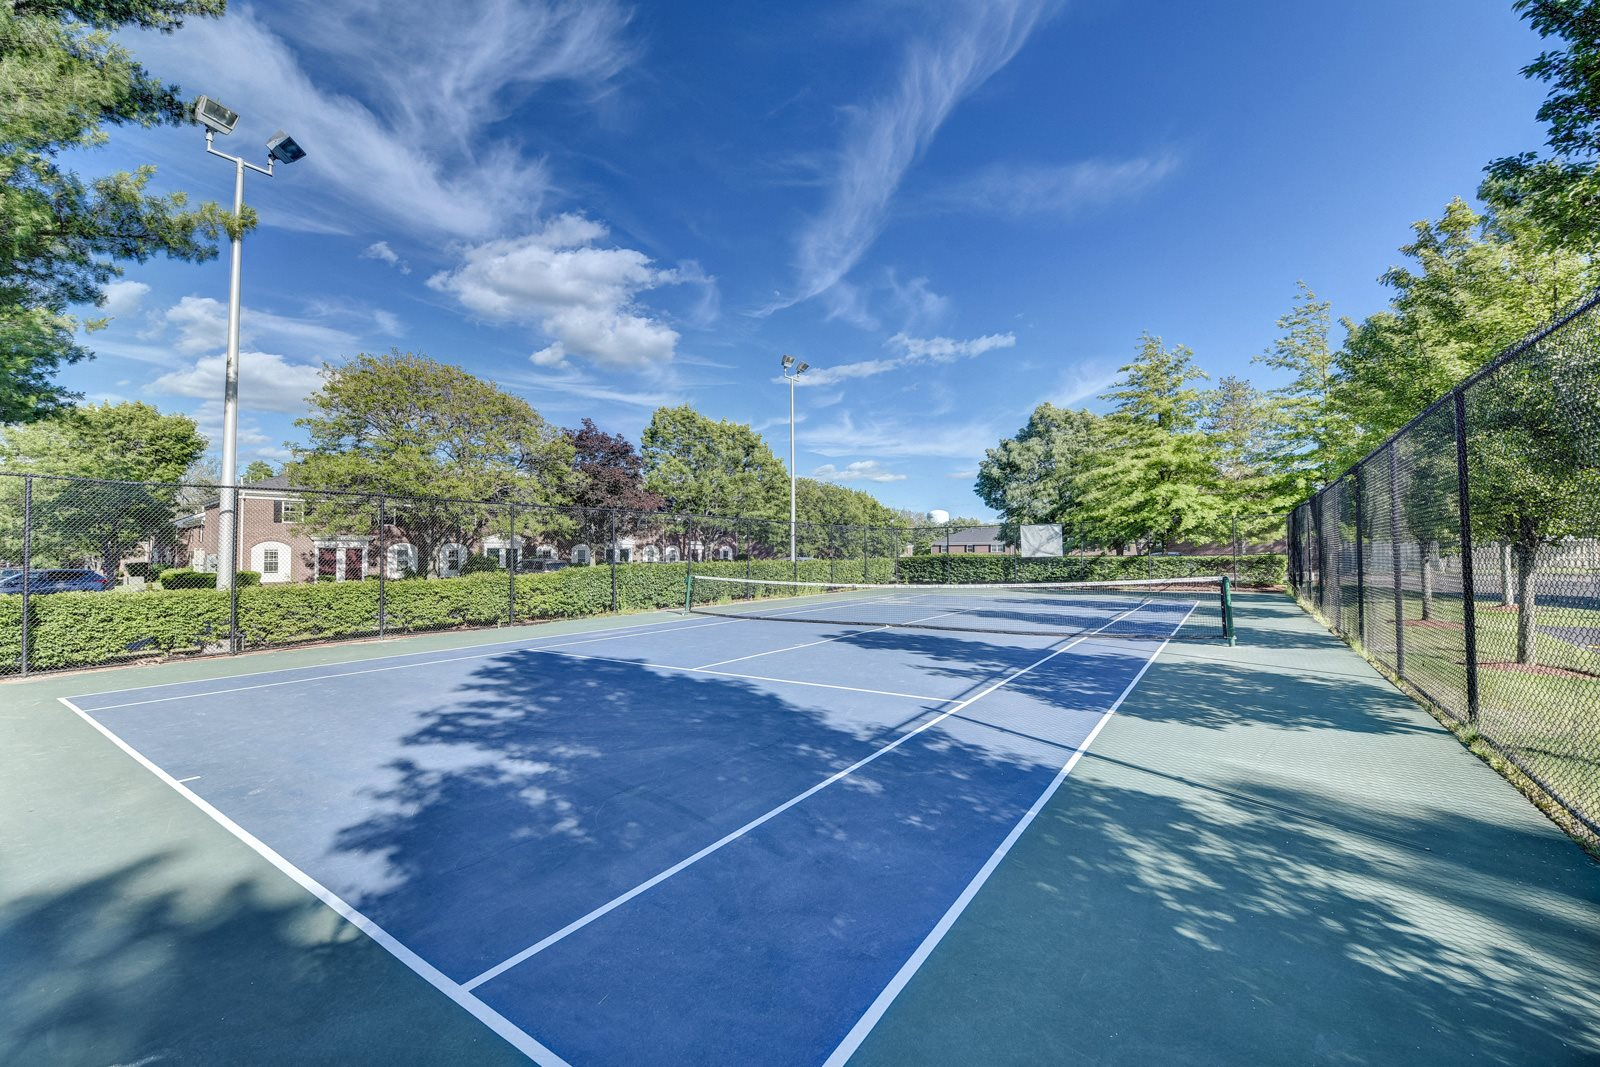 Lighted Regulation Tennis Court at Windsor Ridge at Westborough, Westborough, Massachusetts